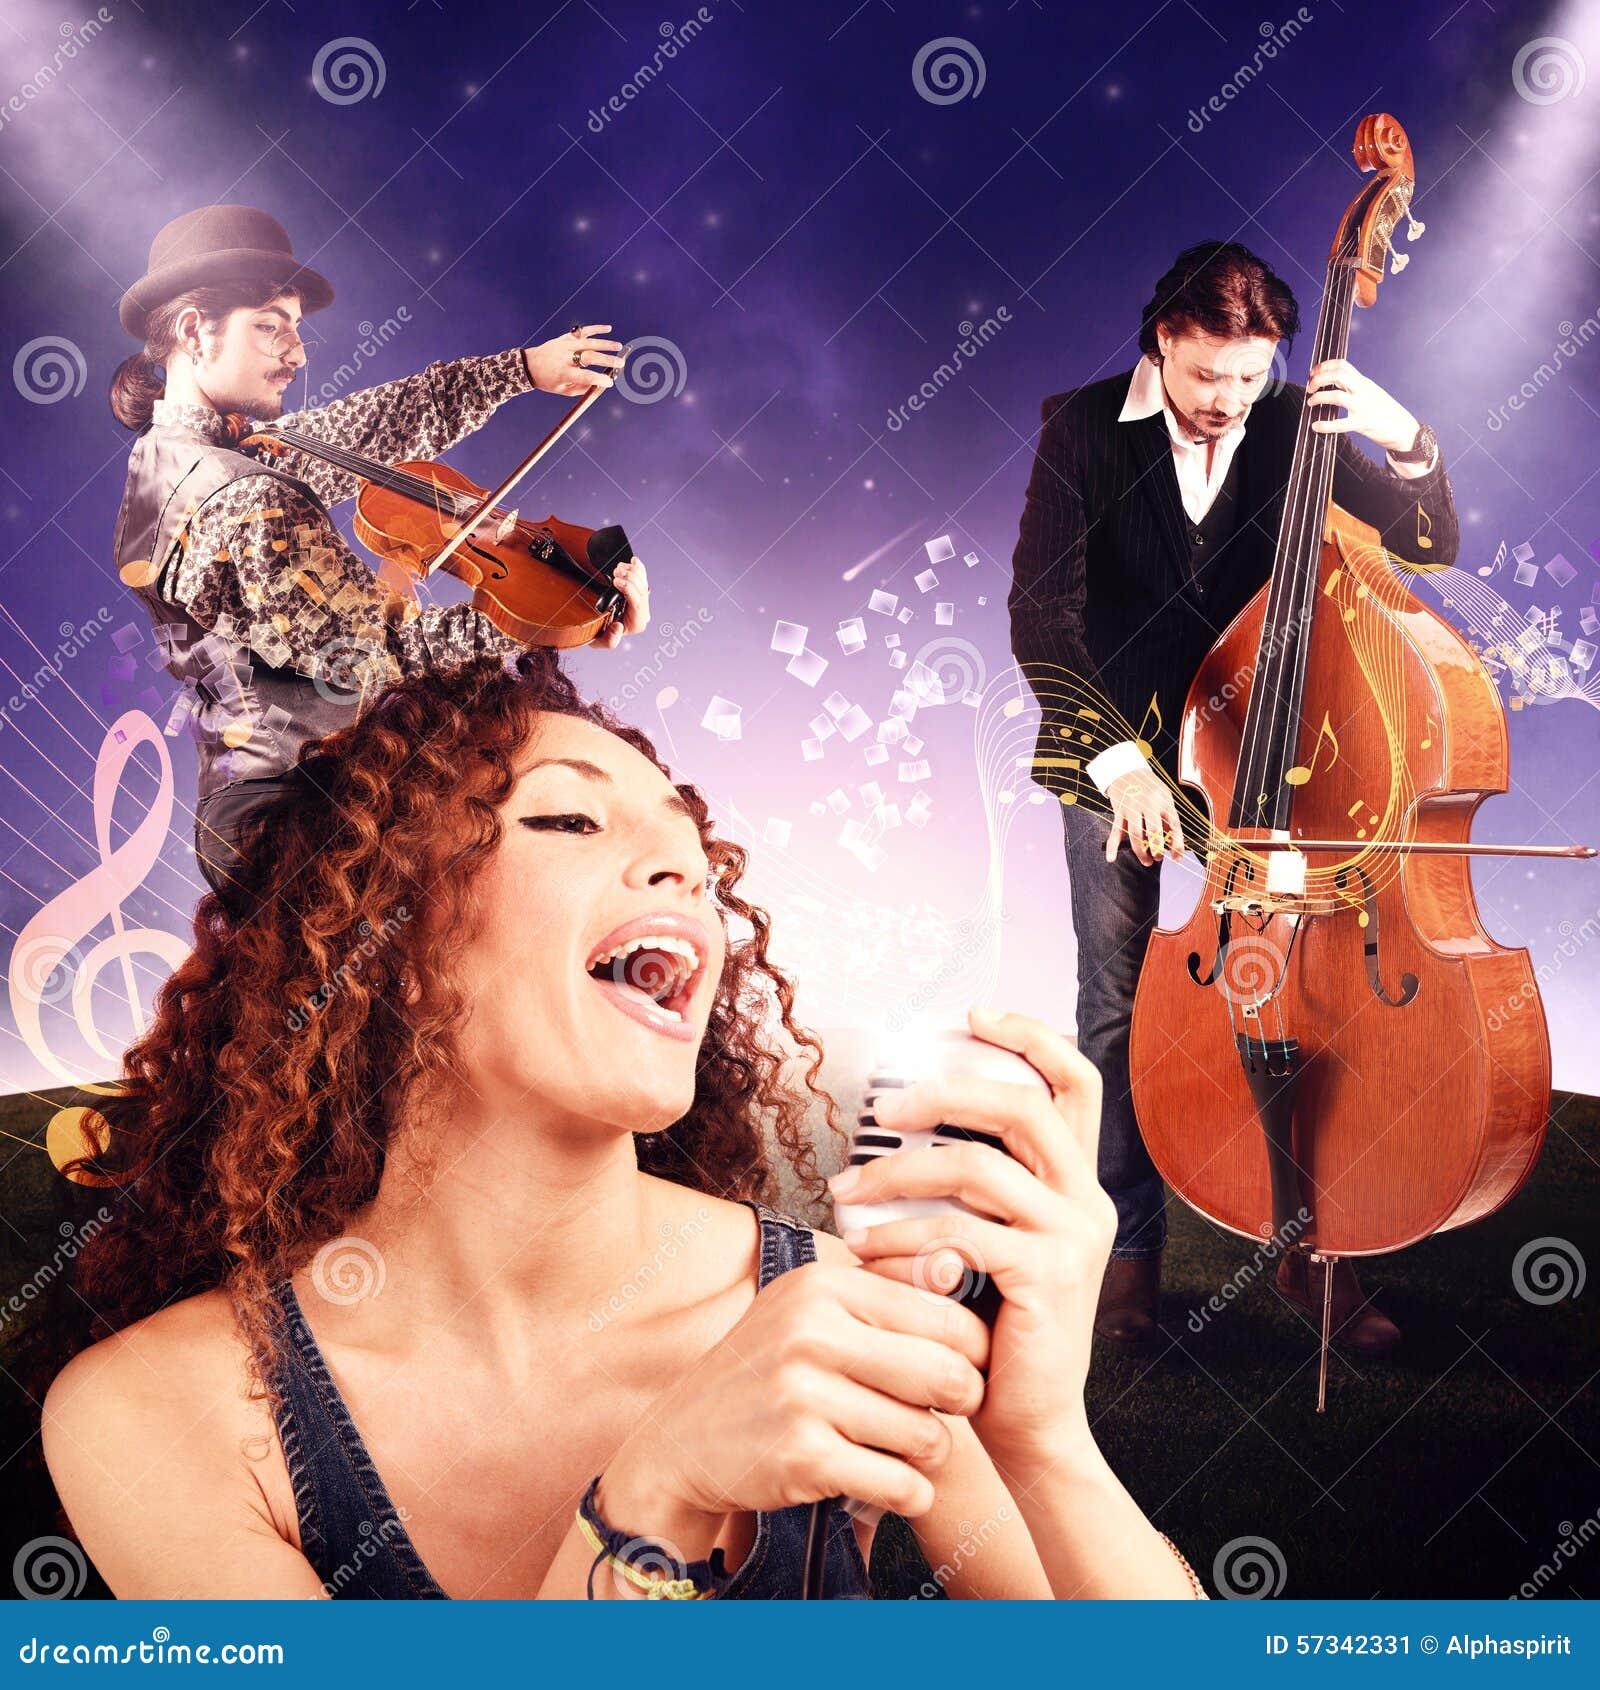 Concert Under the Stars